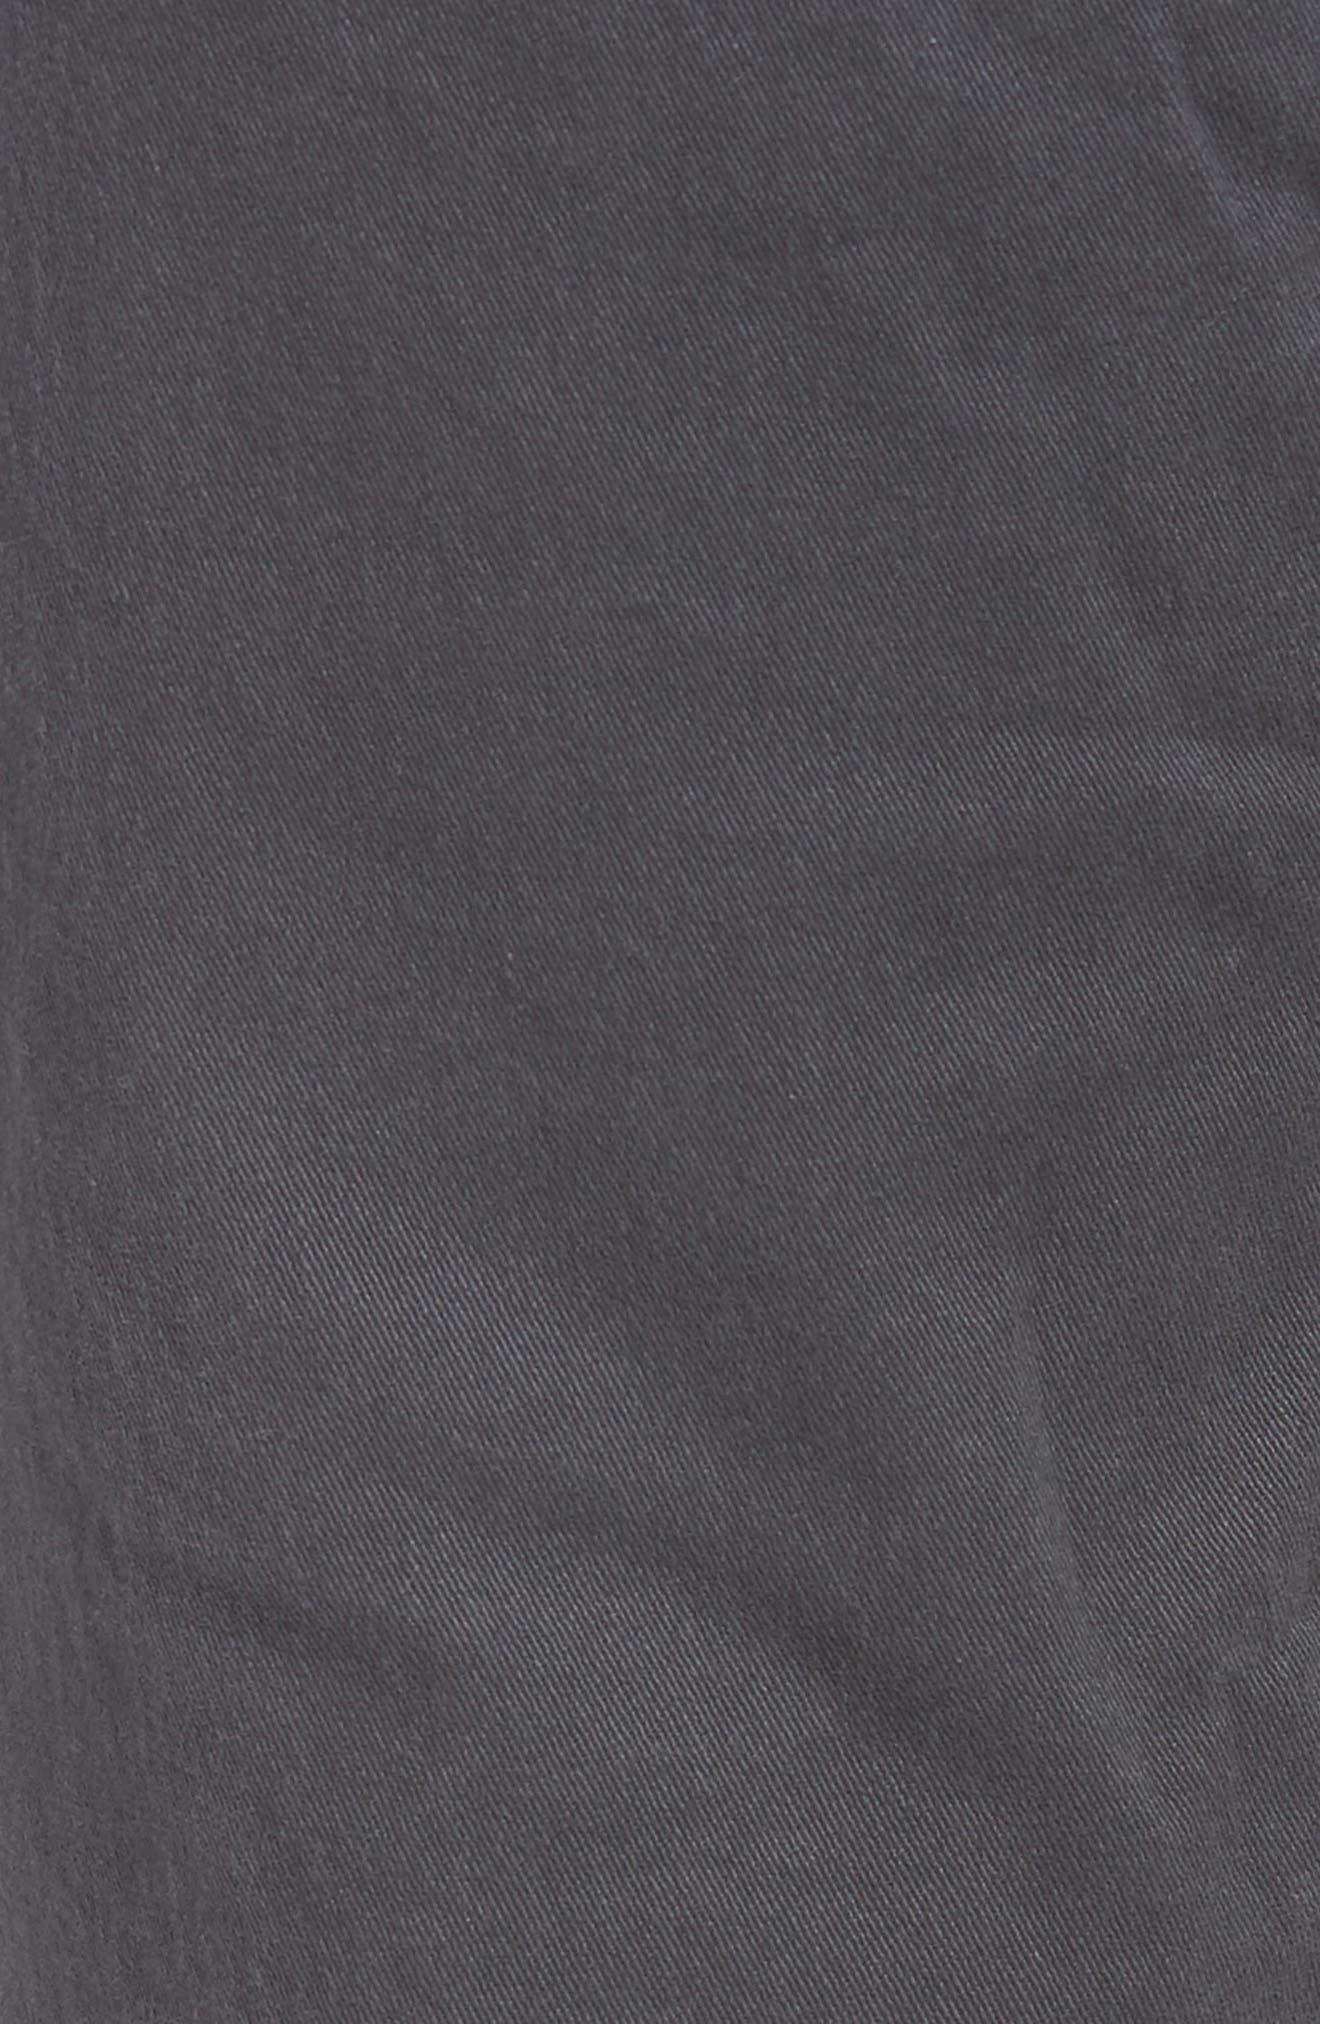 Jogger Pants,                             Alternate thumbnail 5, color,                             Grey Onyx